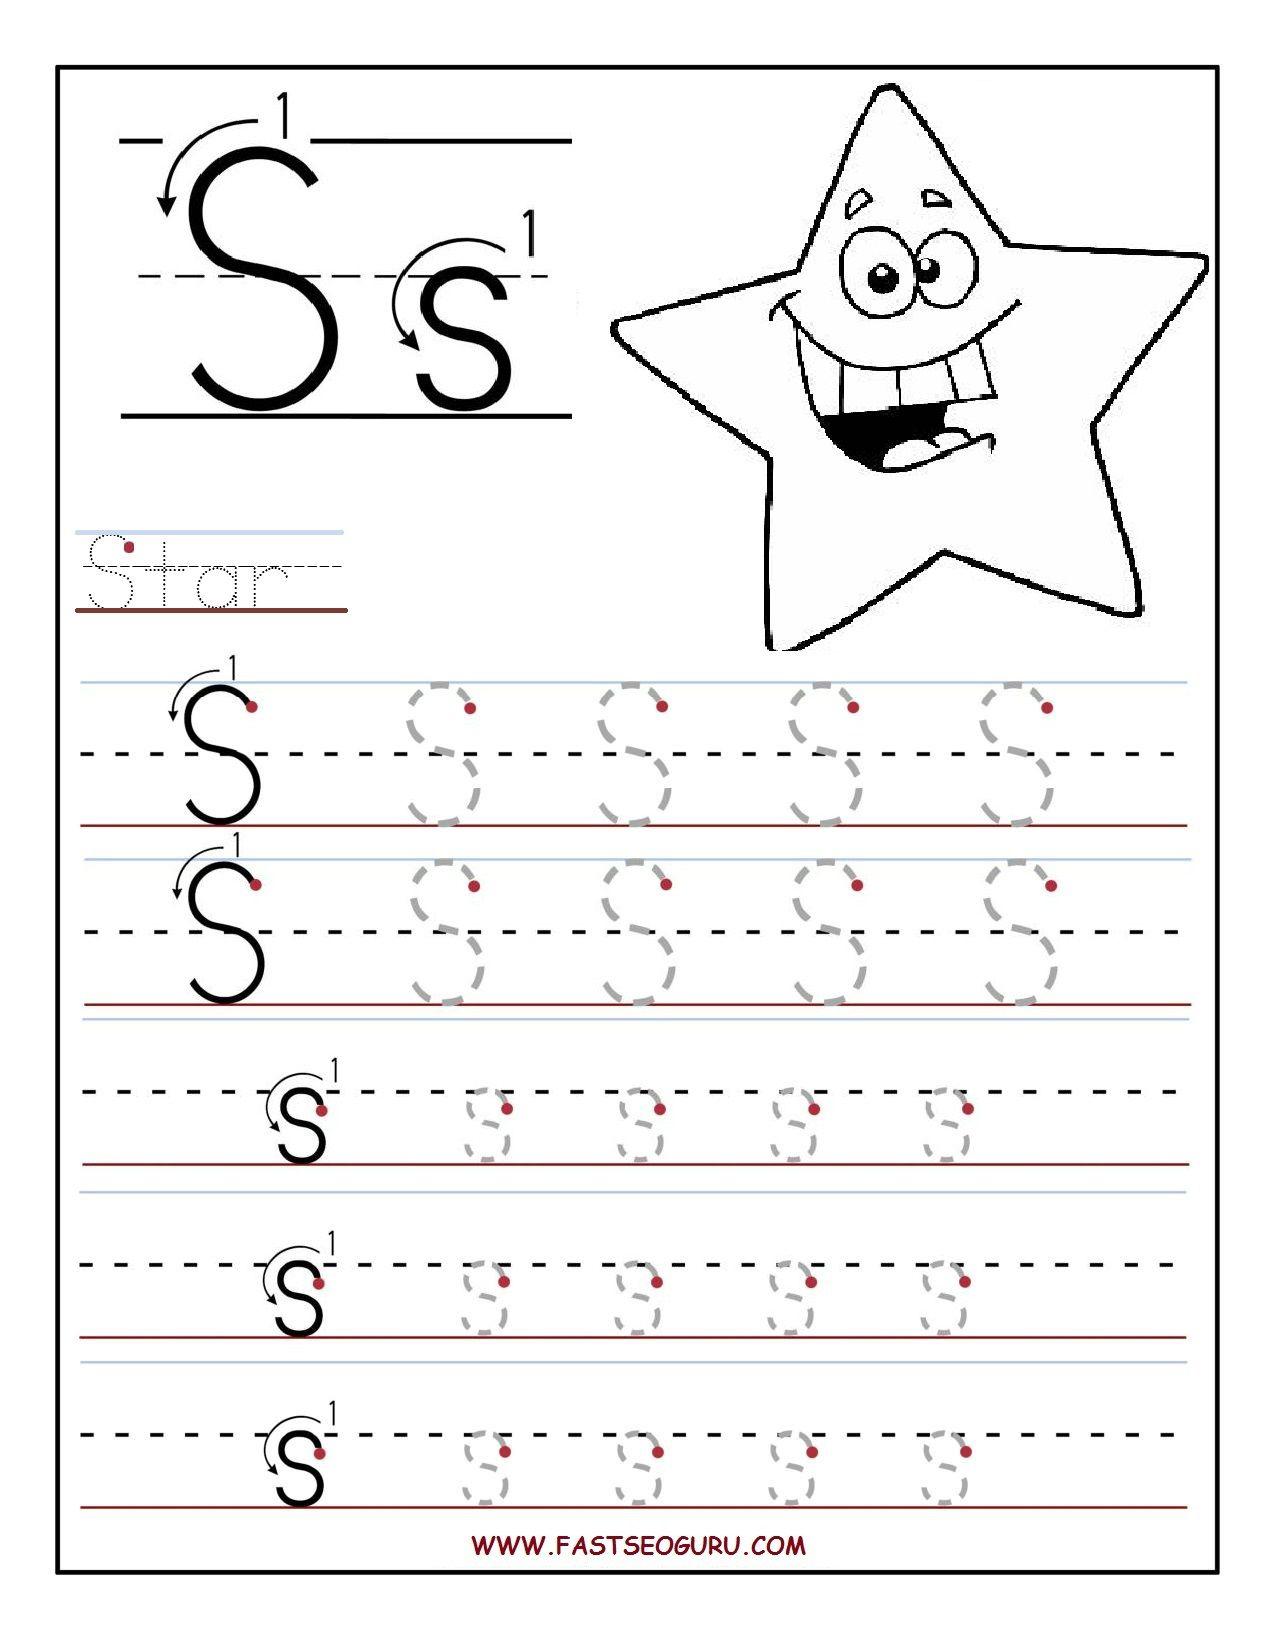 Pinkatie Mueller On Growing Place | Preschool Worksheets for Letter S Worksheets Printable